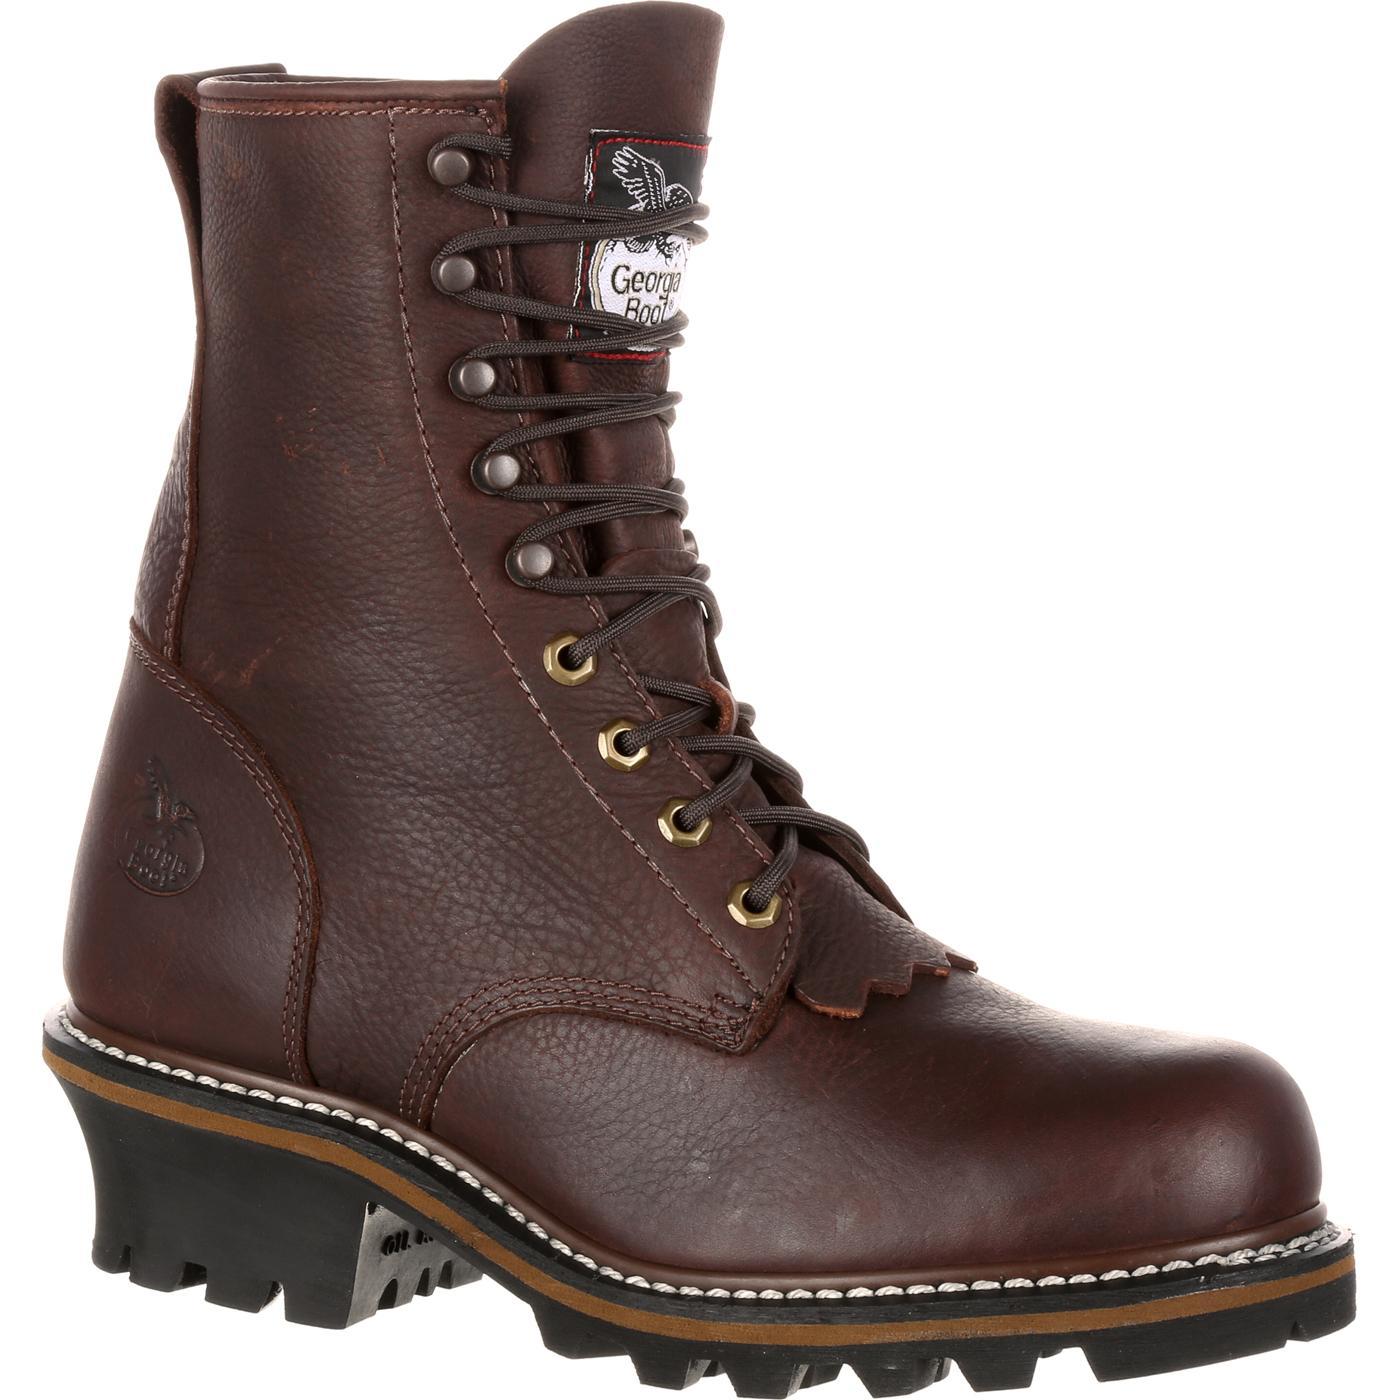 Georgia Boot Men S Logger Work Boots Style Gb0105ia